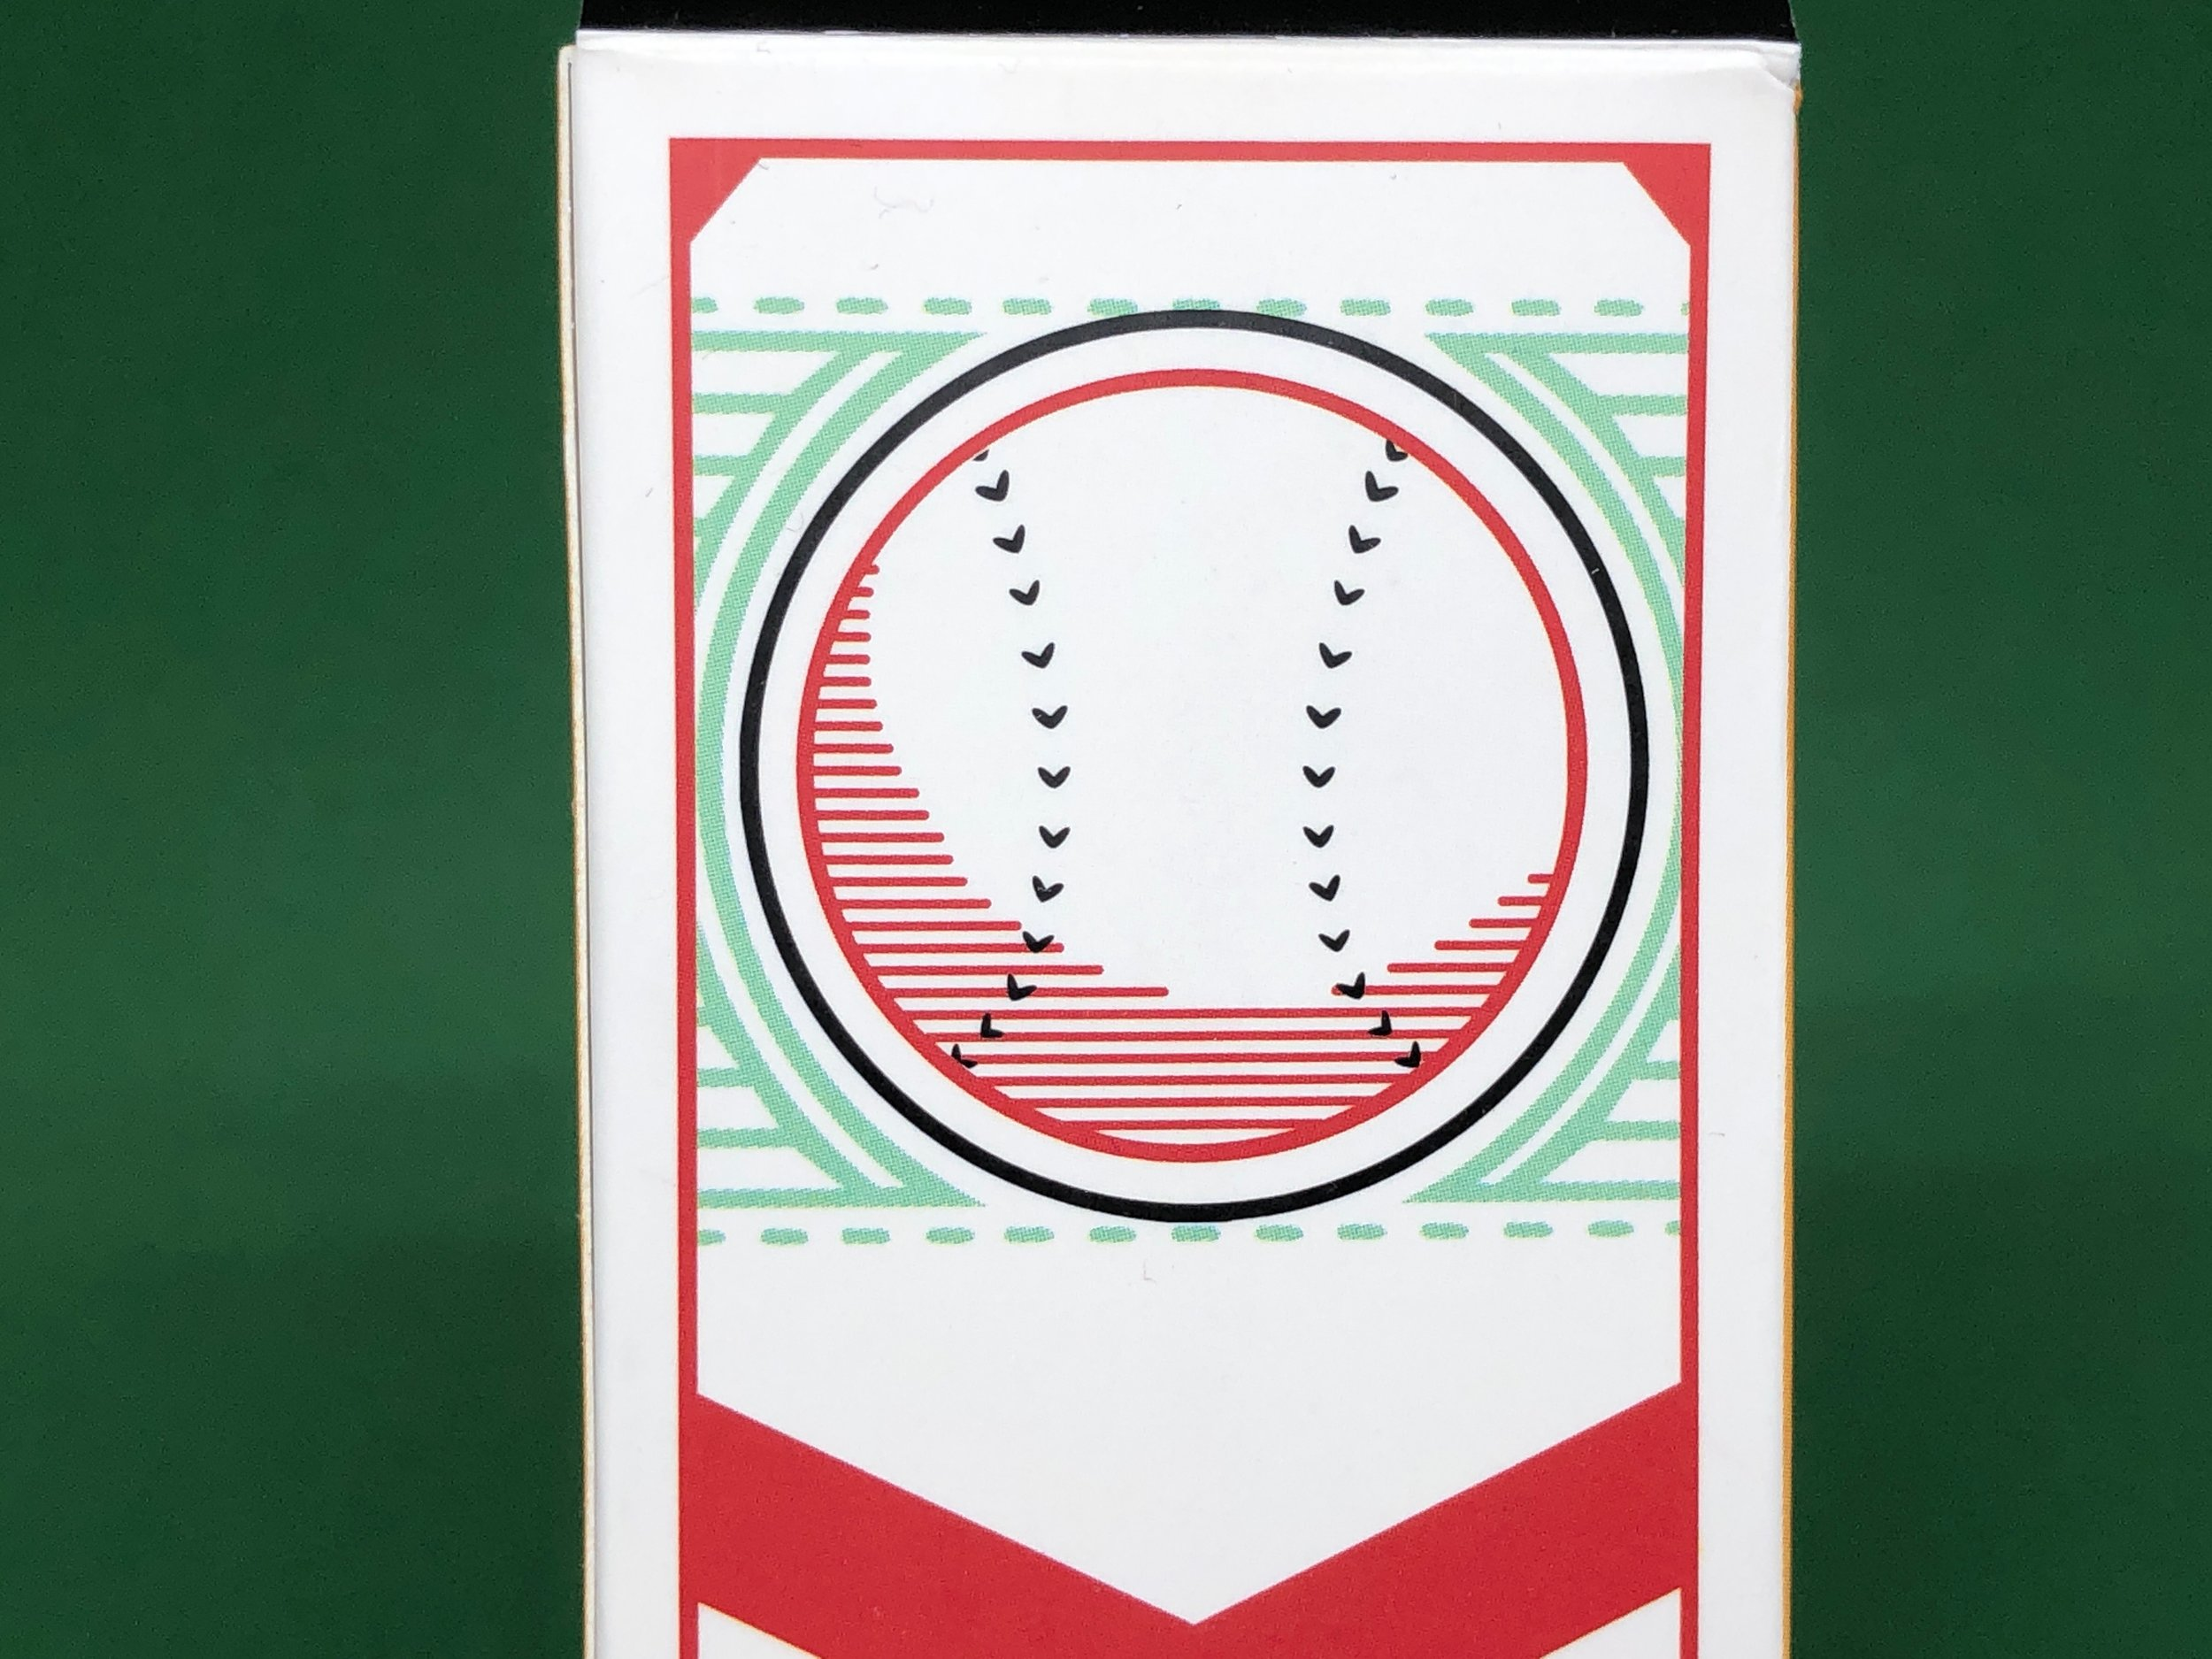 cwpe-generals-baseball-scoring-pencil-8.jpg